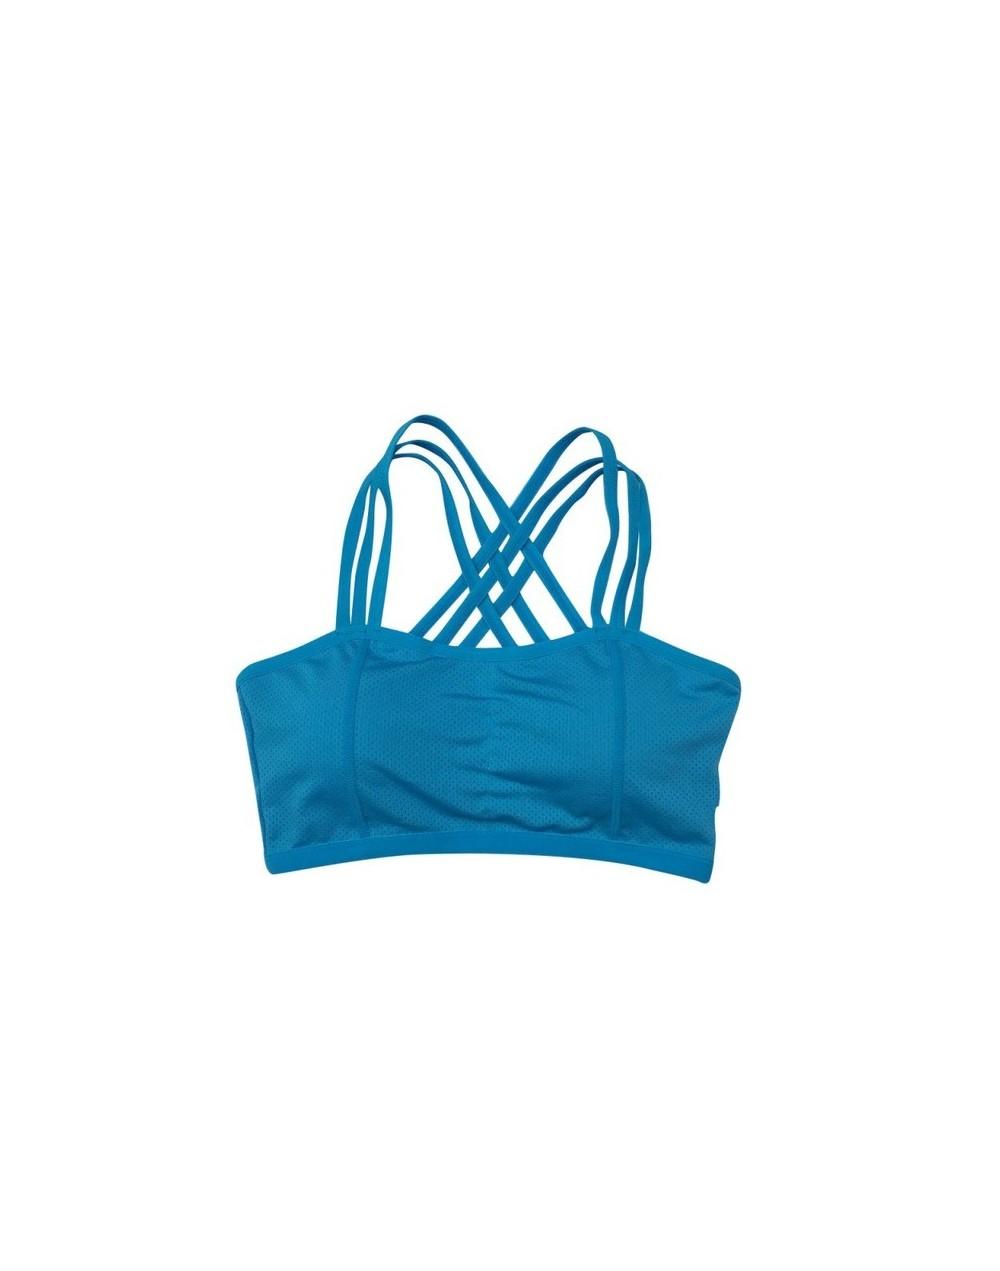 Women's Vest Bra Crop Top Seamless Fitness Bra Tank Tops Girls Wire Free Breathable Underwear Bra - Sports Bra - 4L3013309593-2